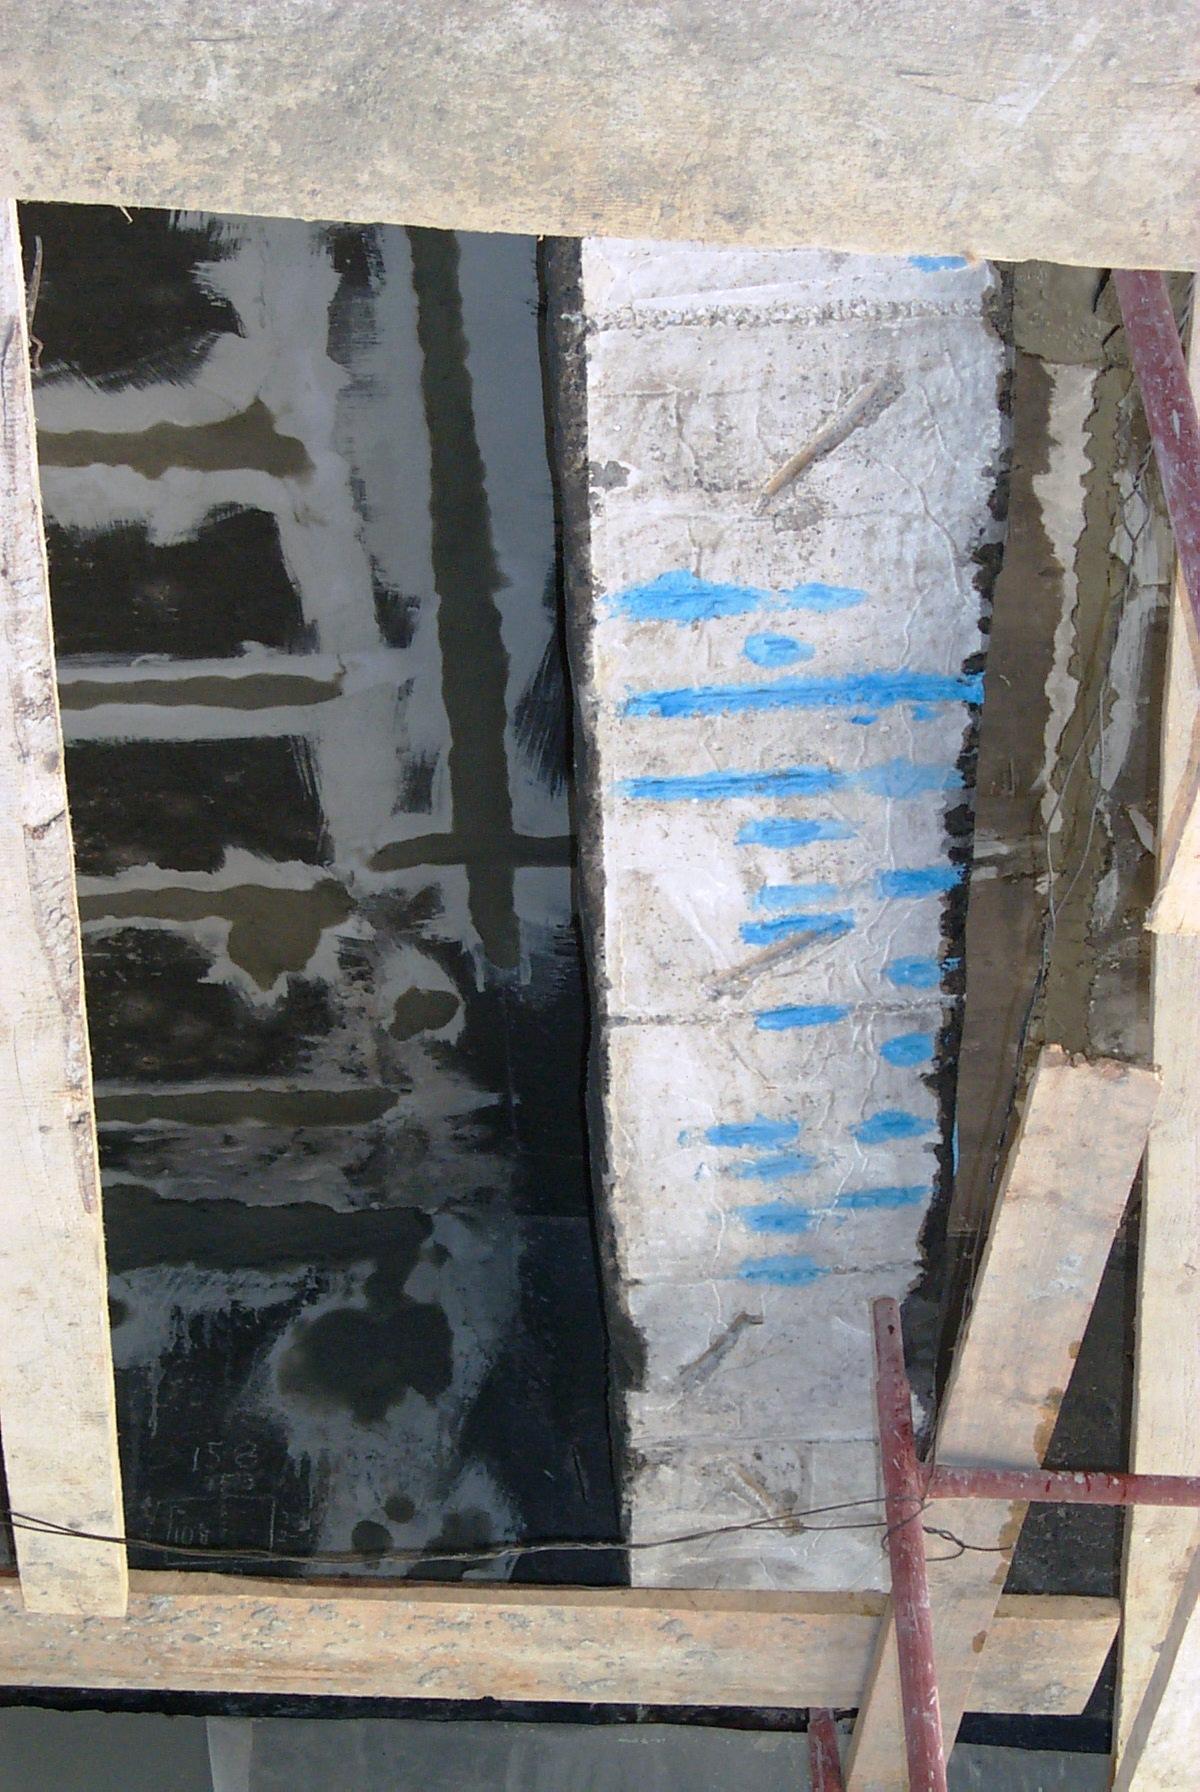 Reparatii pasaje km 11 si 13 pe A1 MAPEI - Poza 70